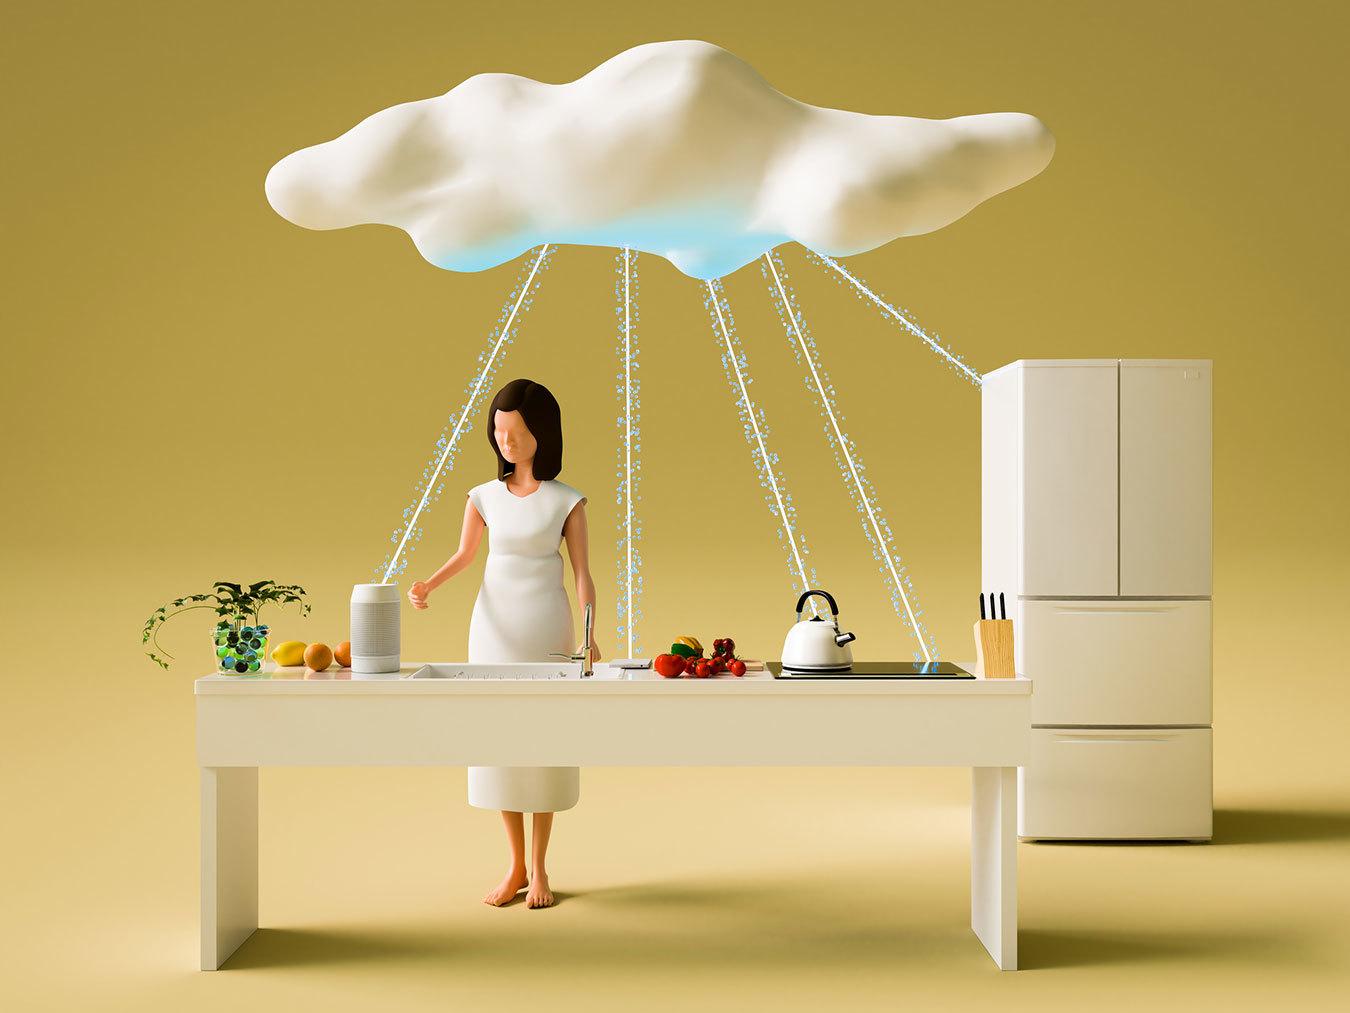 IoT家電、スマート家電から、未来のキッチンを知る